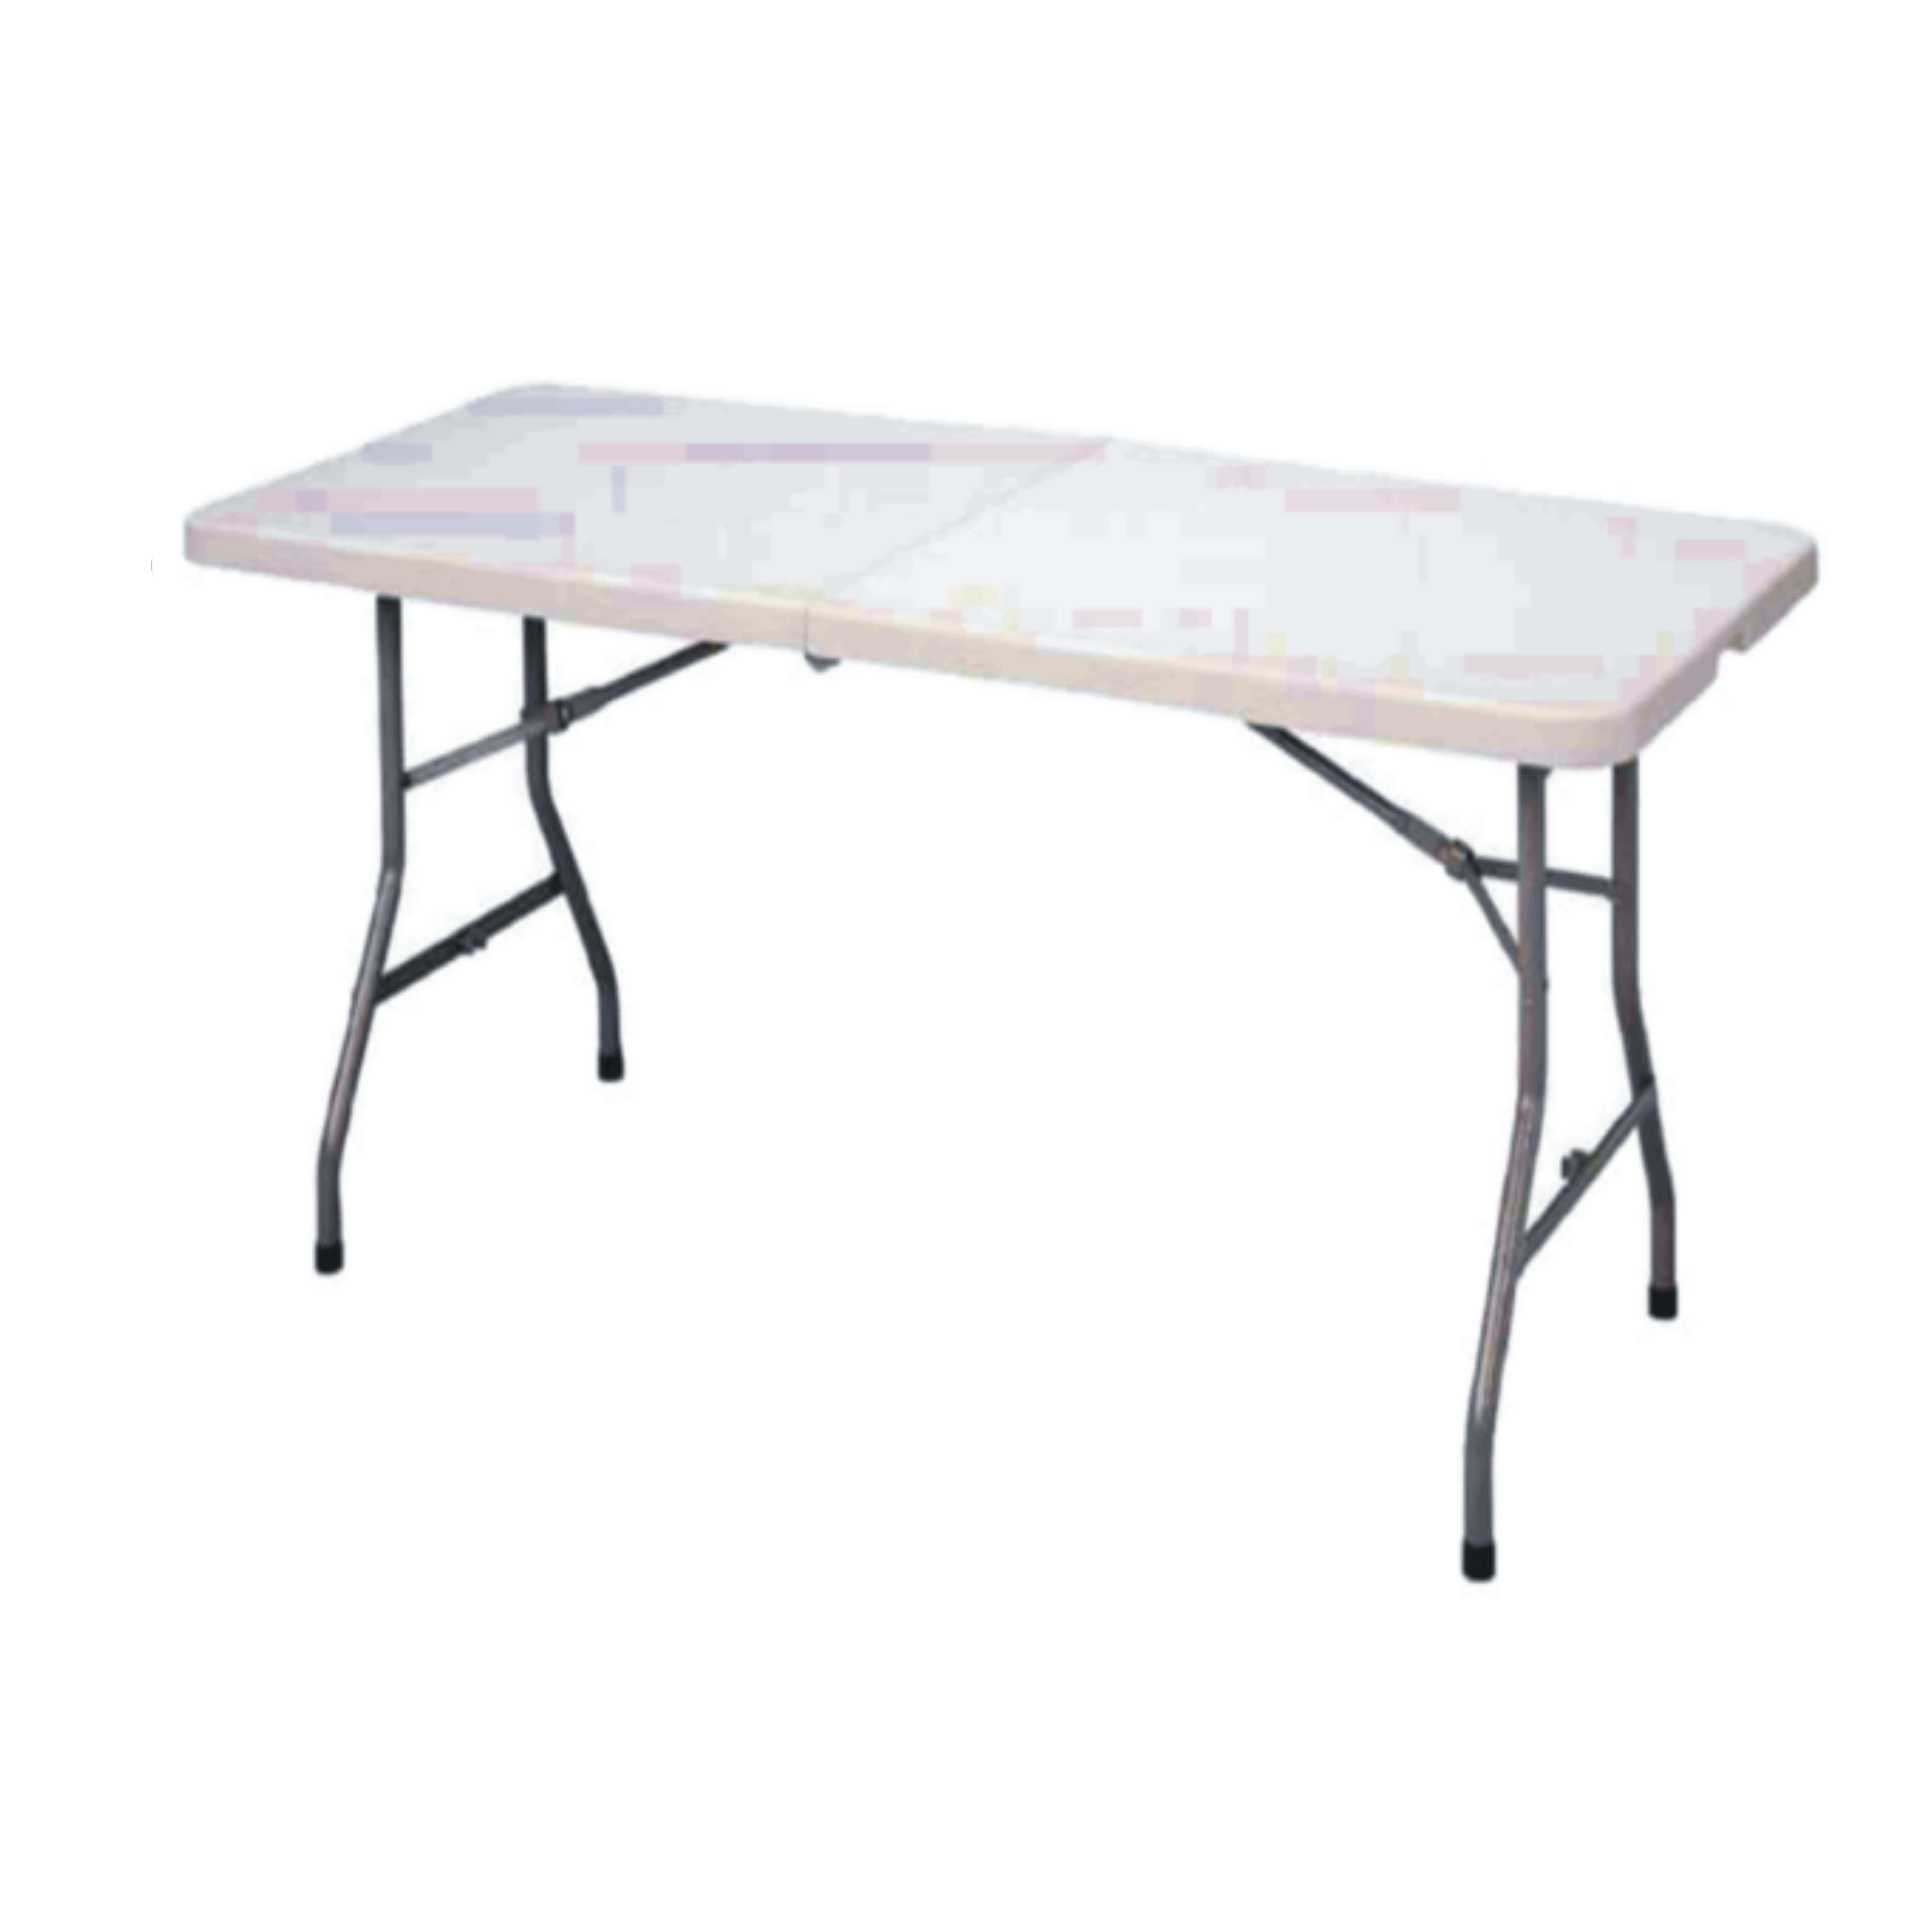 Stupendous Supreme 1 8M Trestle Folding Table White Home Interior And Landscaping Pimpapssignezvosmurscom